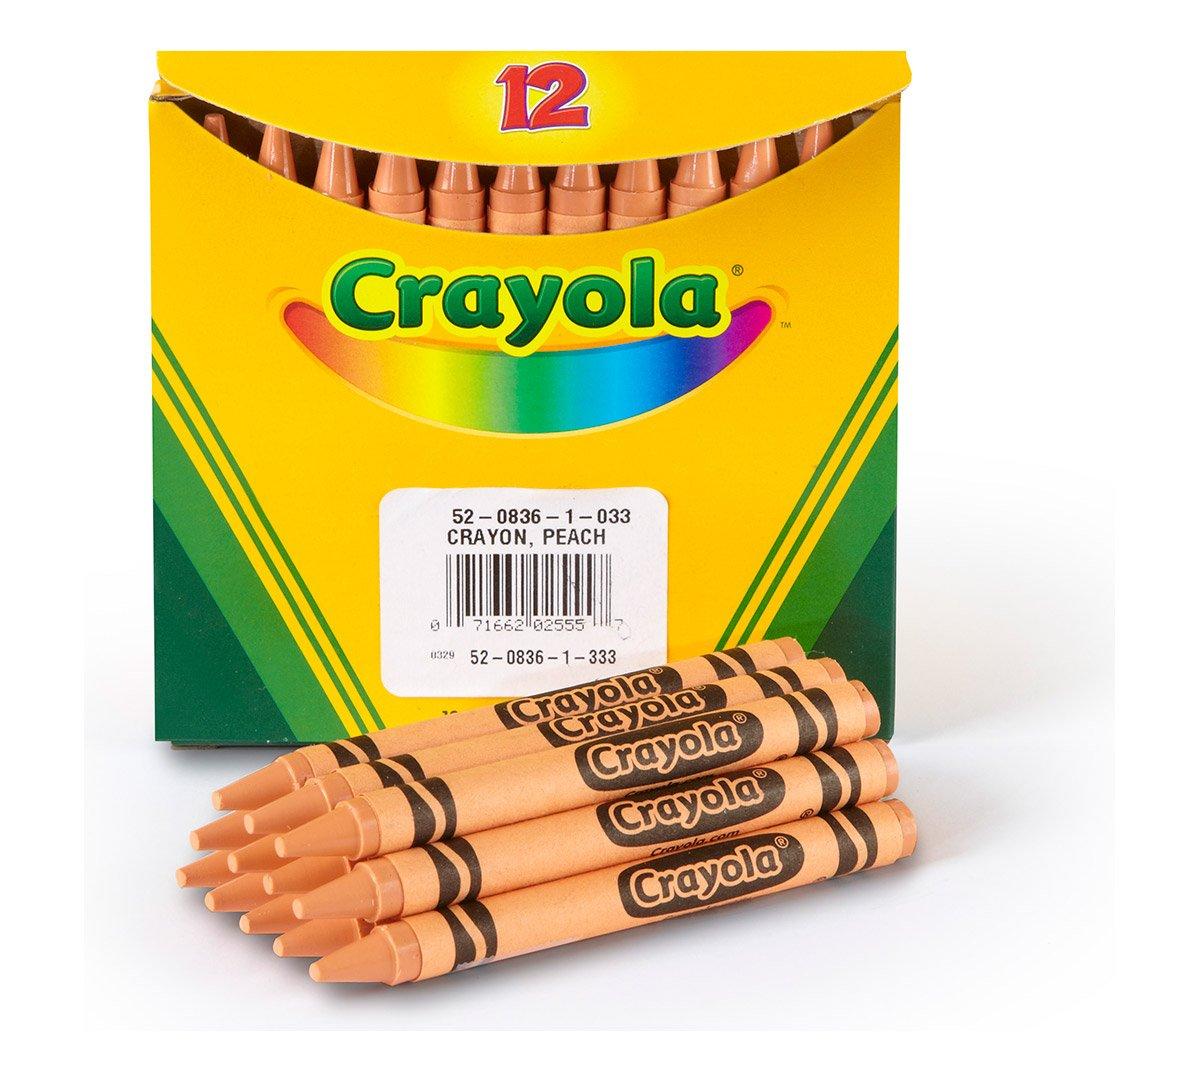 Crayola Bulk Crayons, Regular Size - Peach, Pack of 12 by Crayola (Image #1)